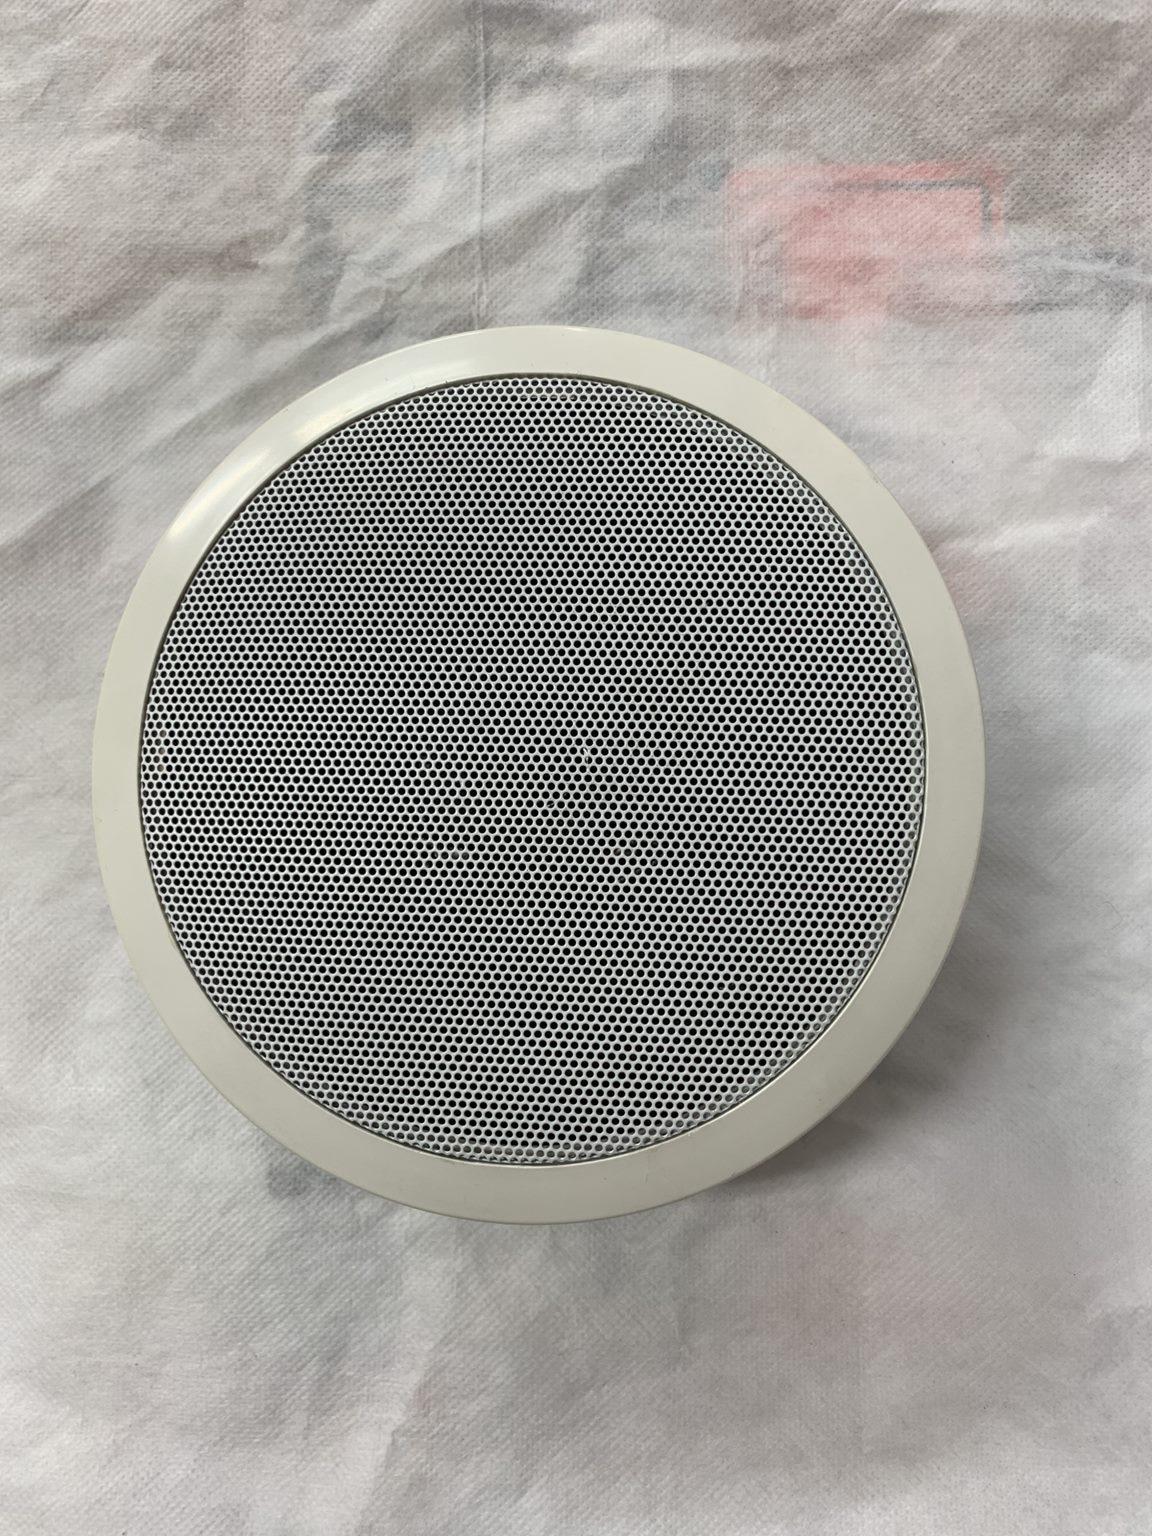 Australian Monitor Powered Ceiling Speaker 6w 6 Inch | Trade Me